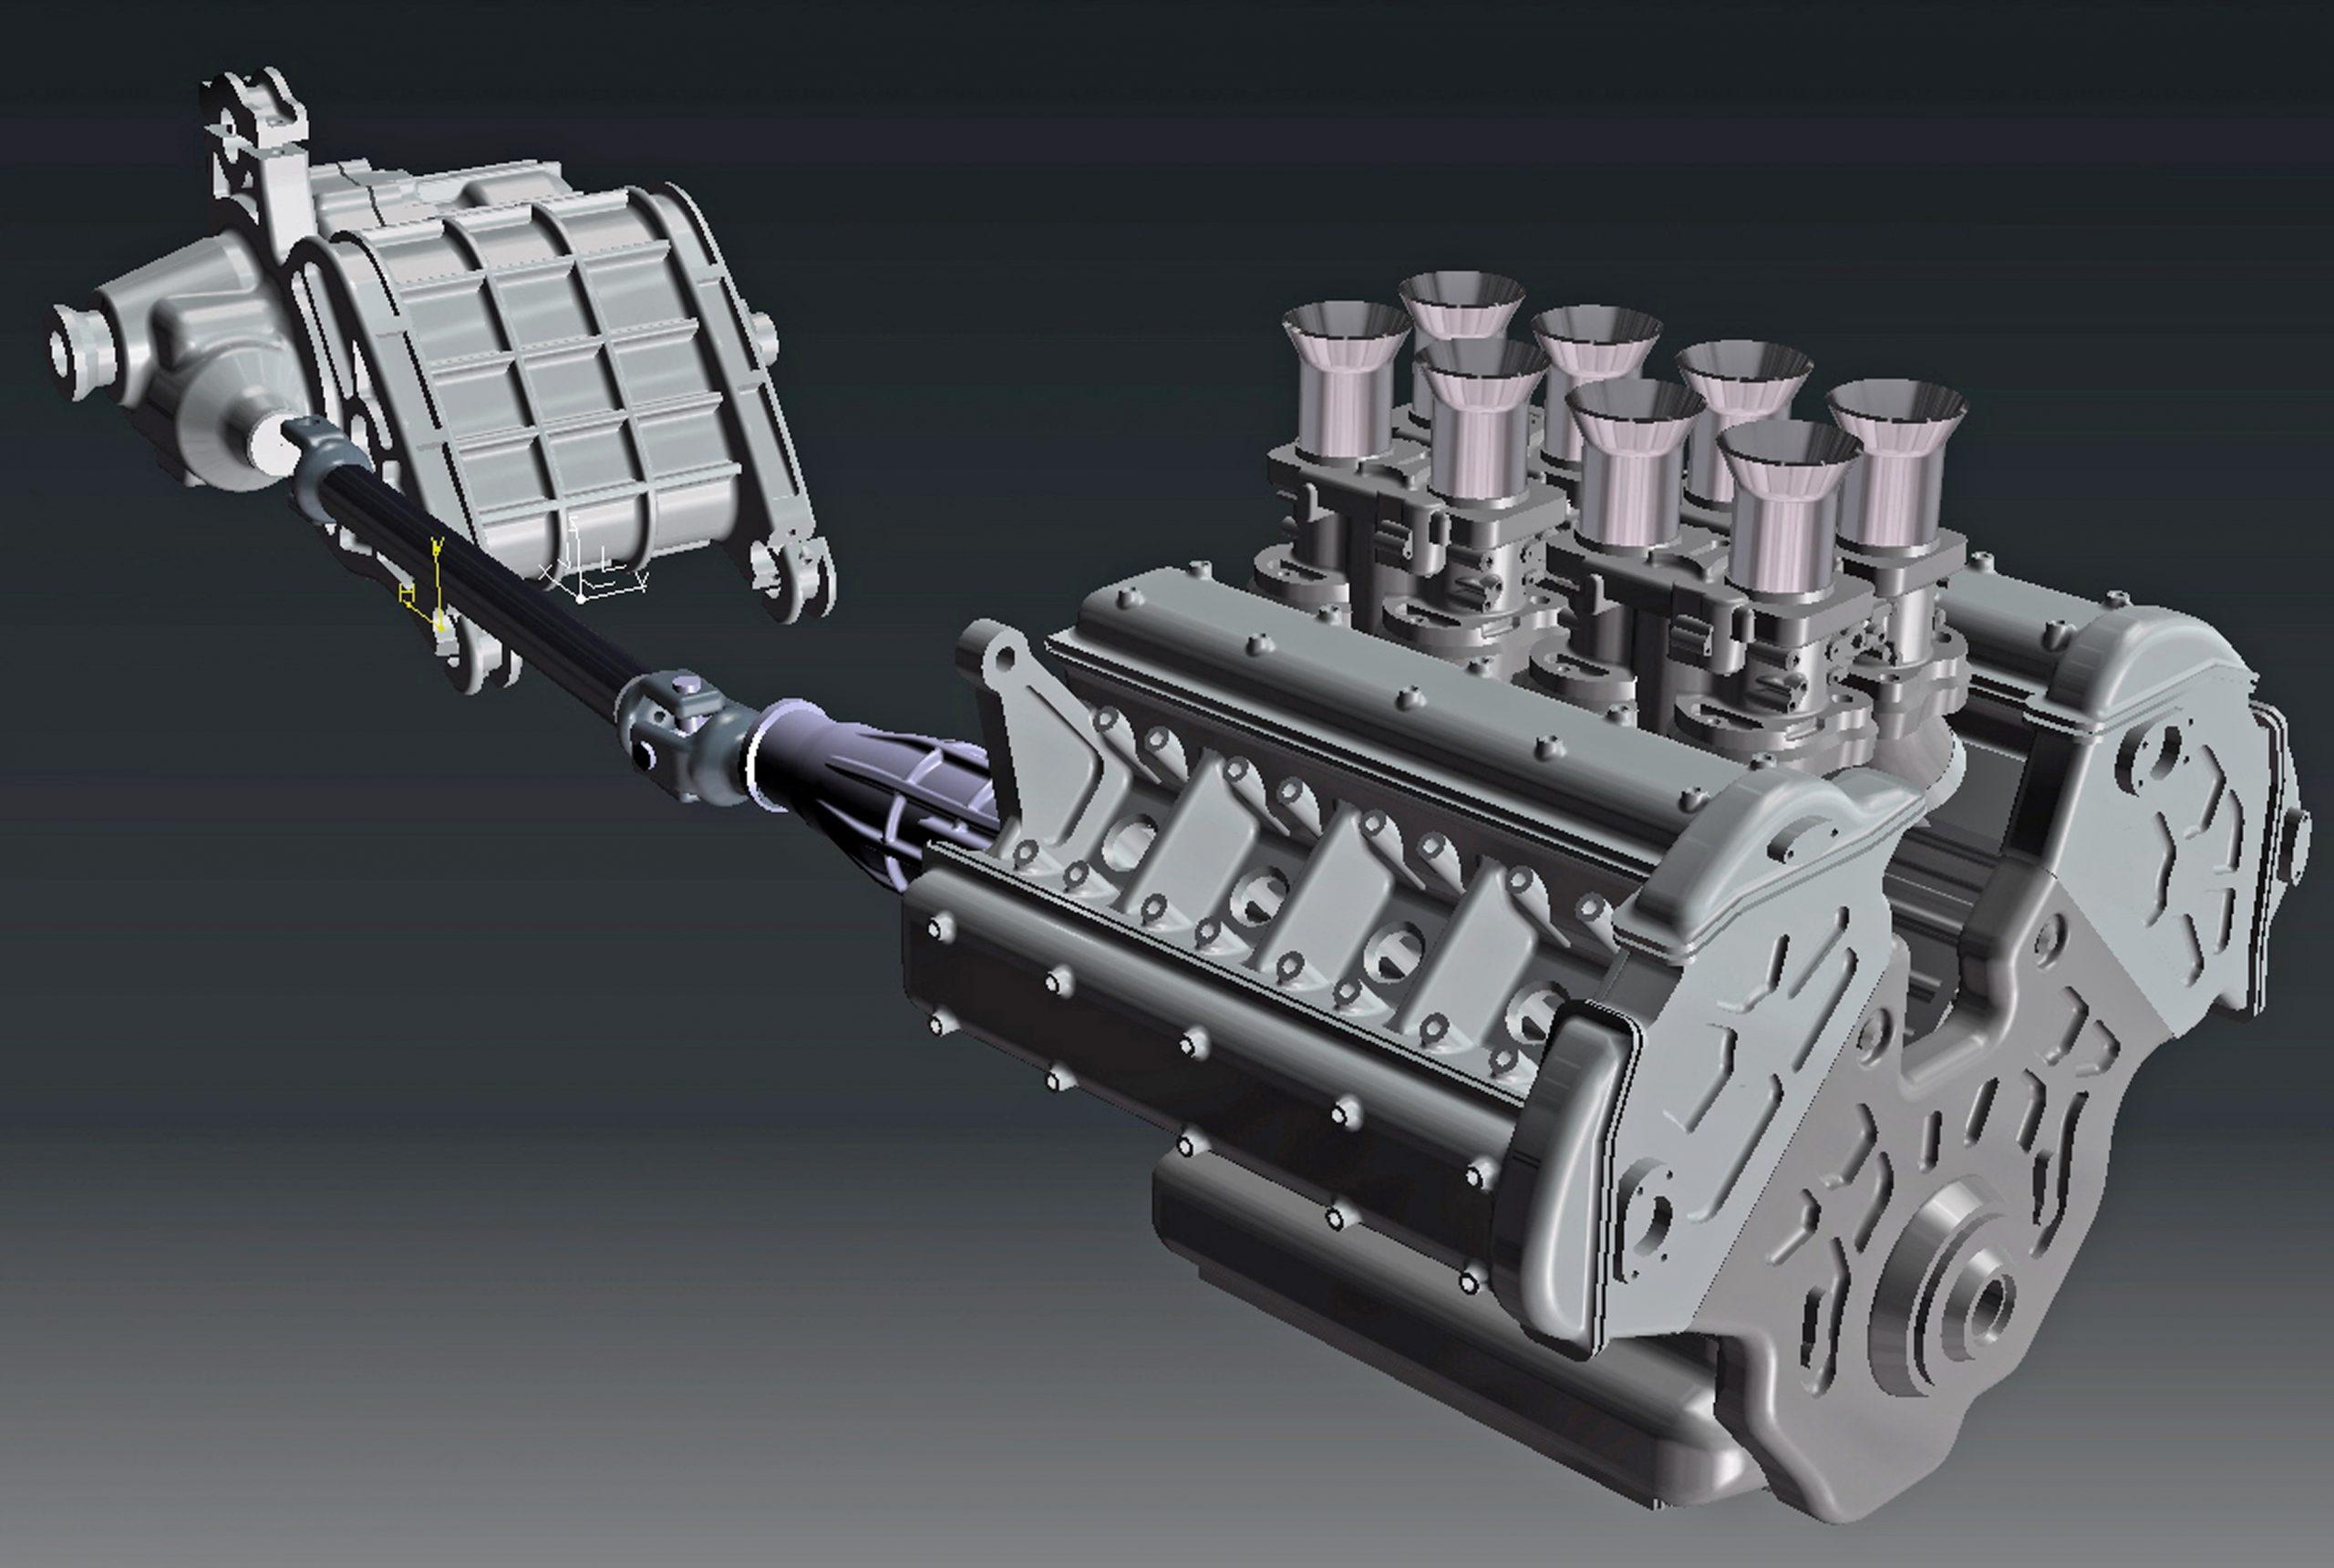 ferrari scale model engine rendering